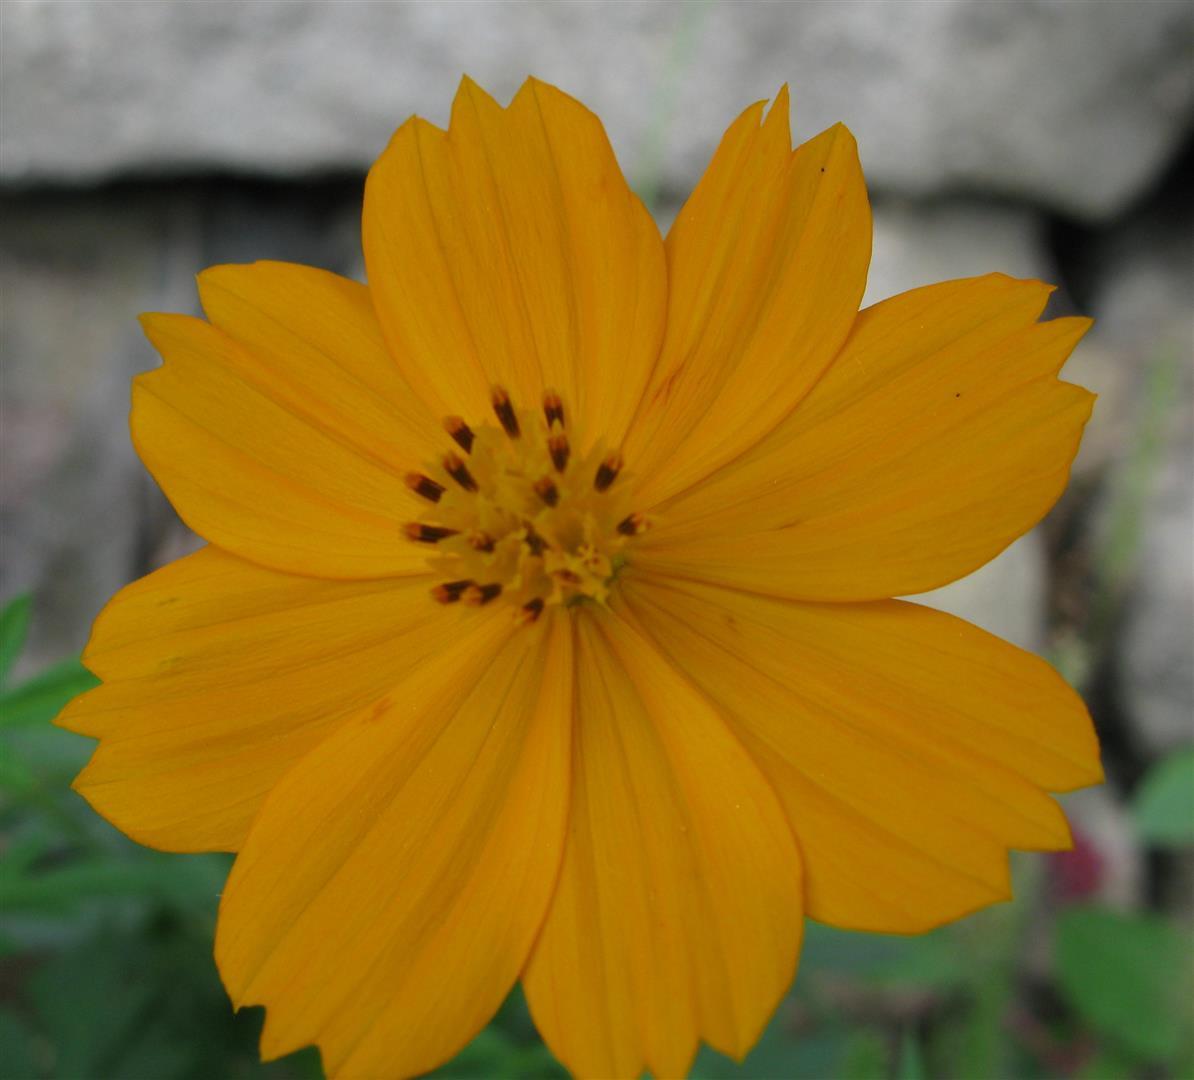 09-septembre-fleurs-2012-4-jpg